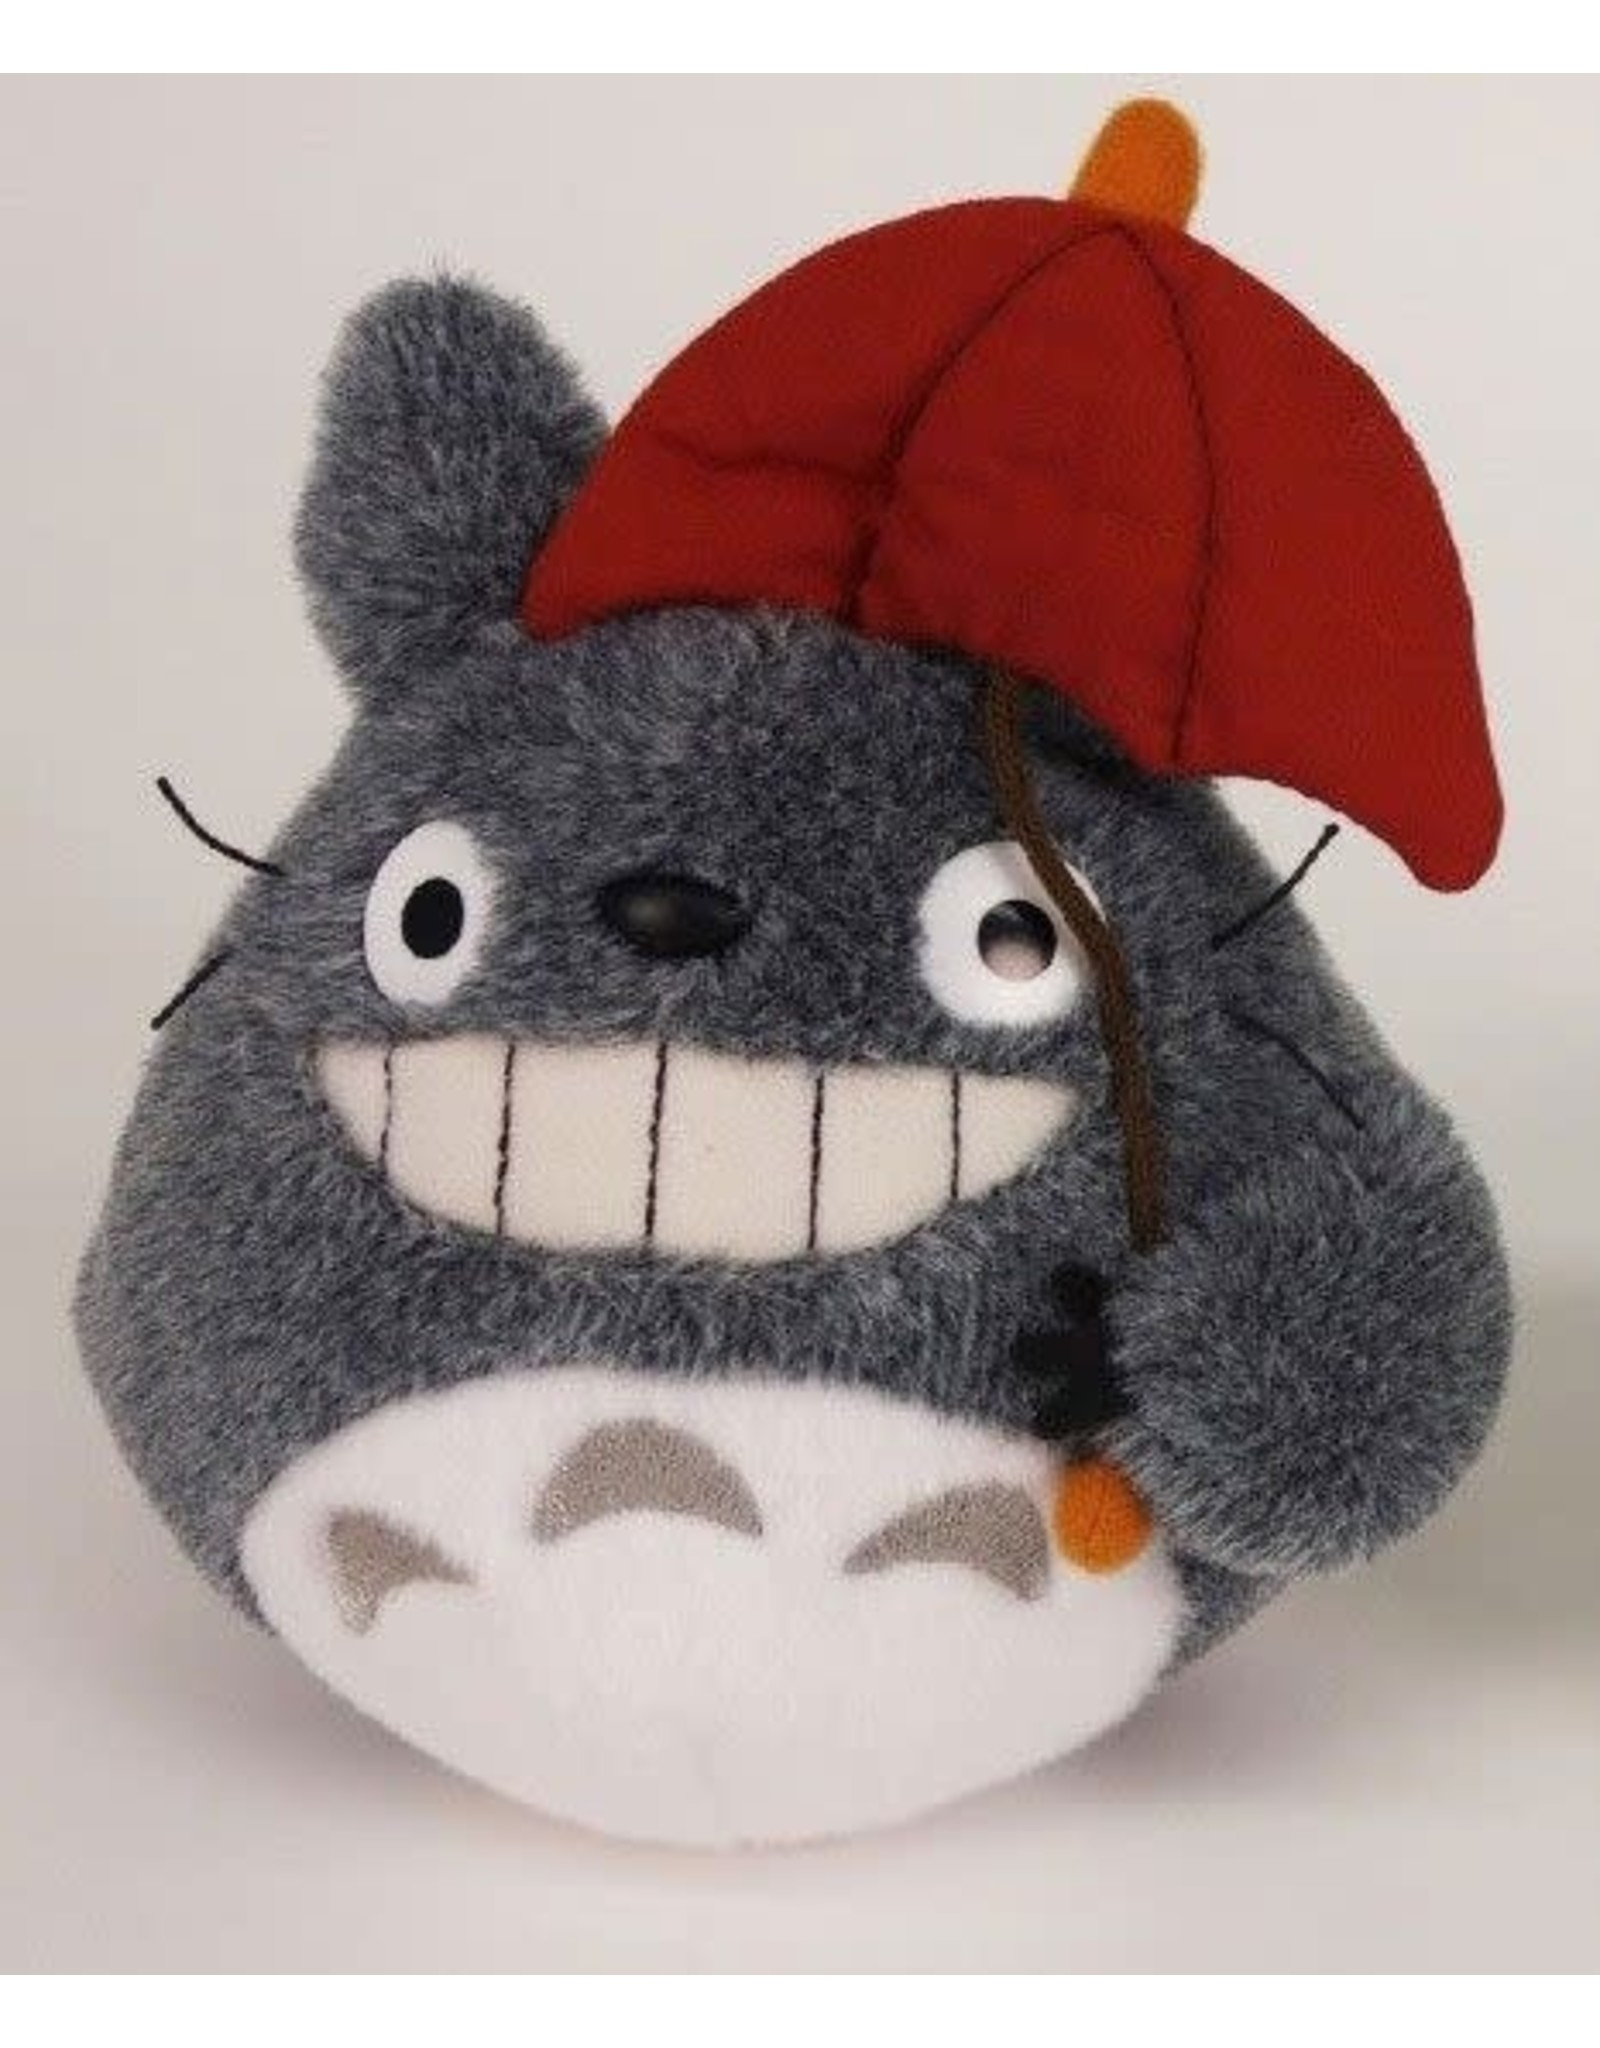 Studio Ghibli Plush - My Neighbor Totoro - Totoro Red Umbrella - 15 cm